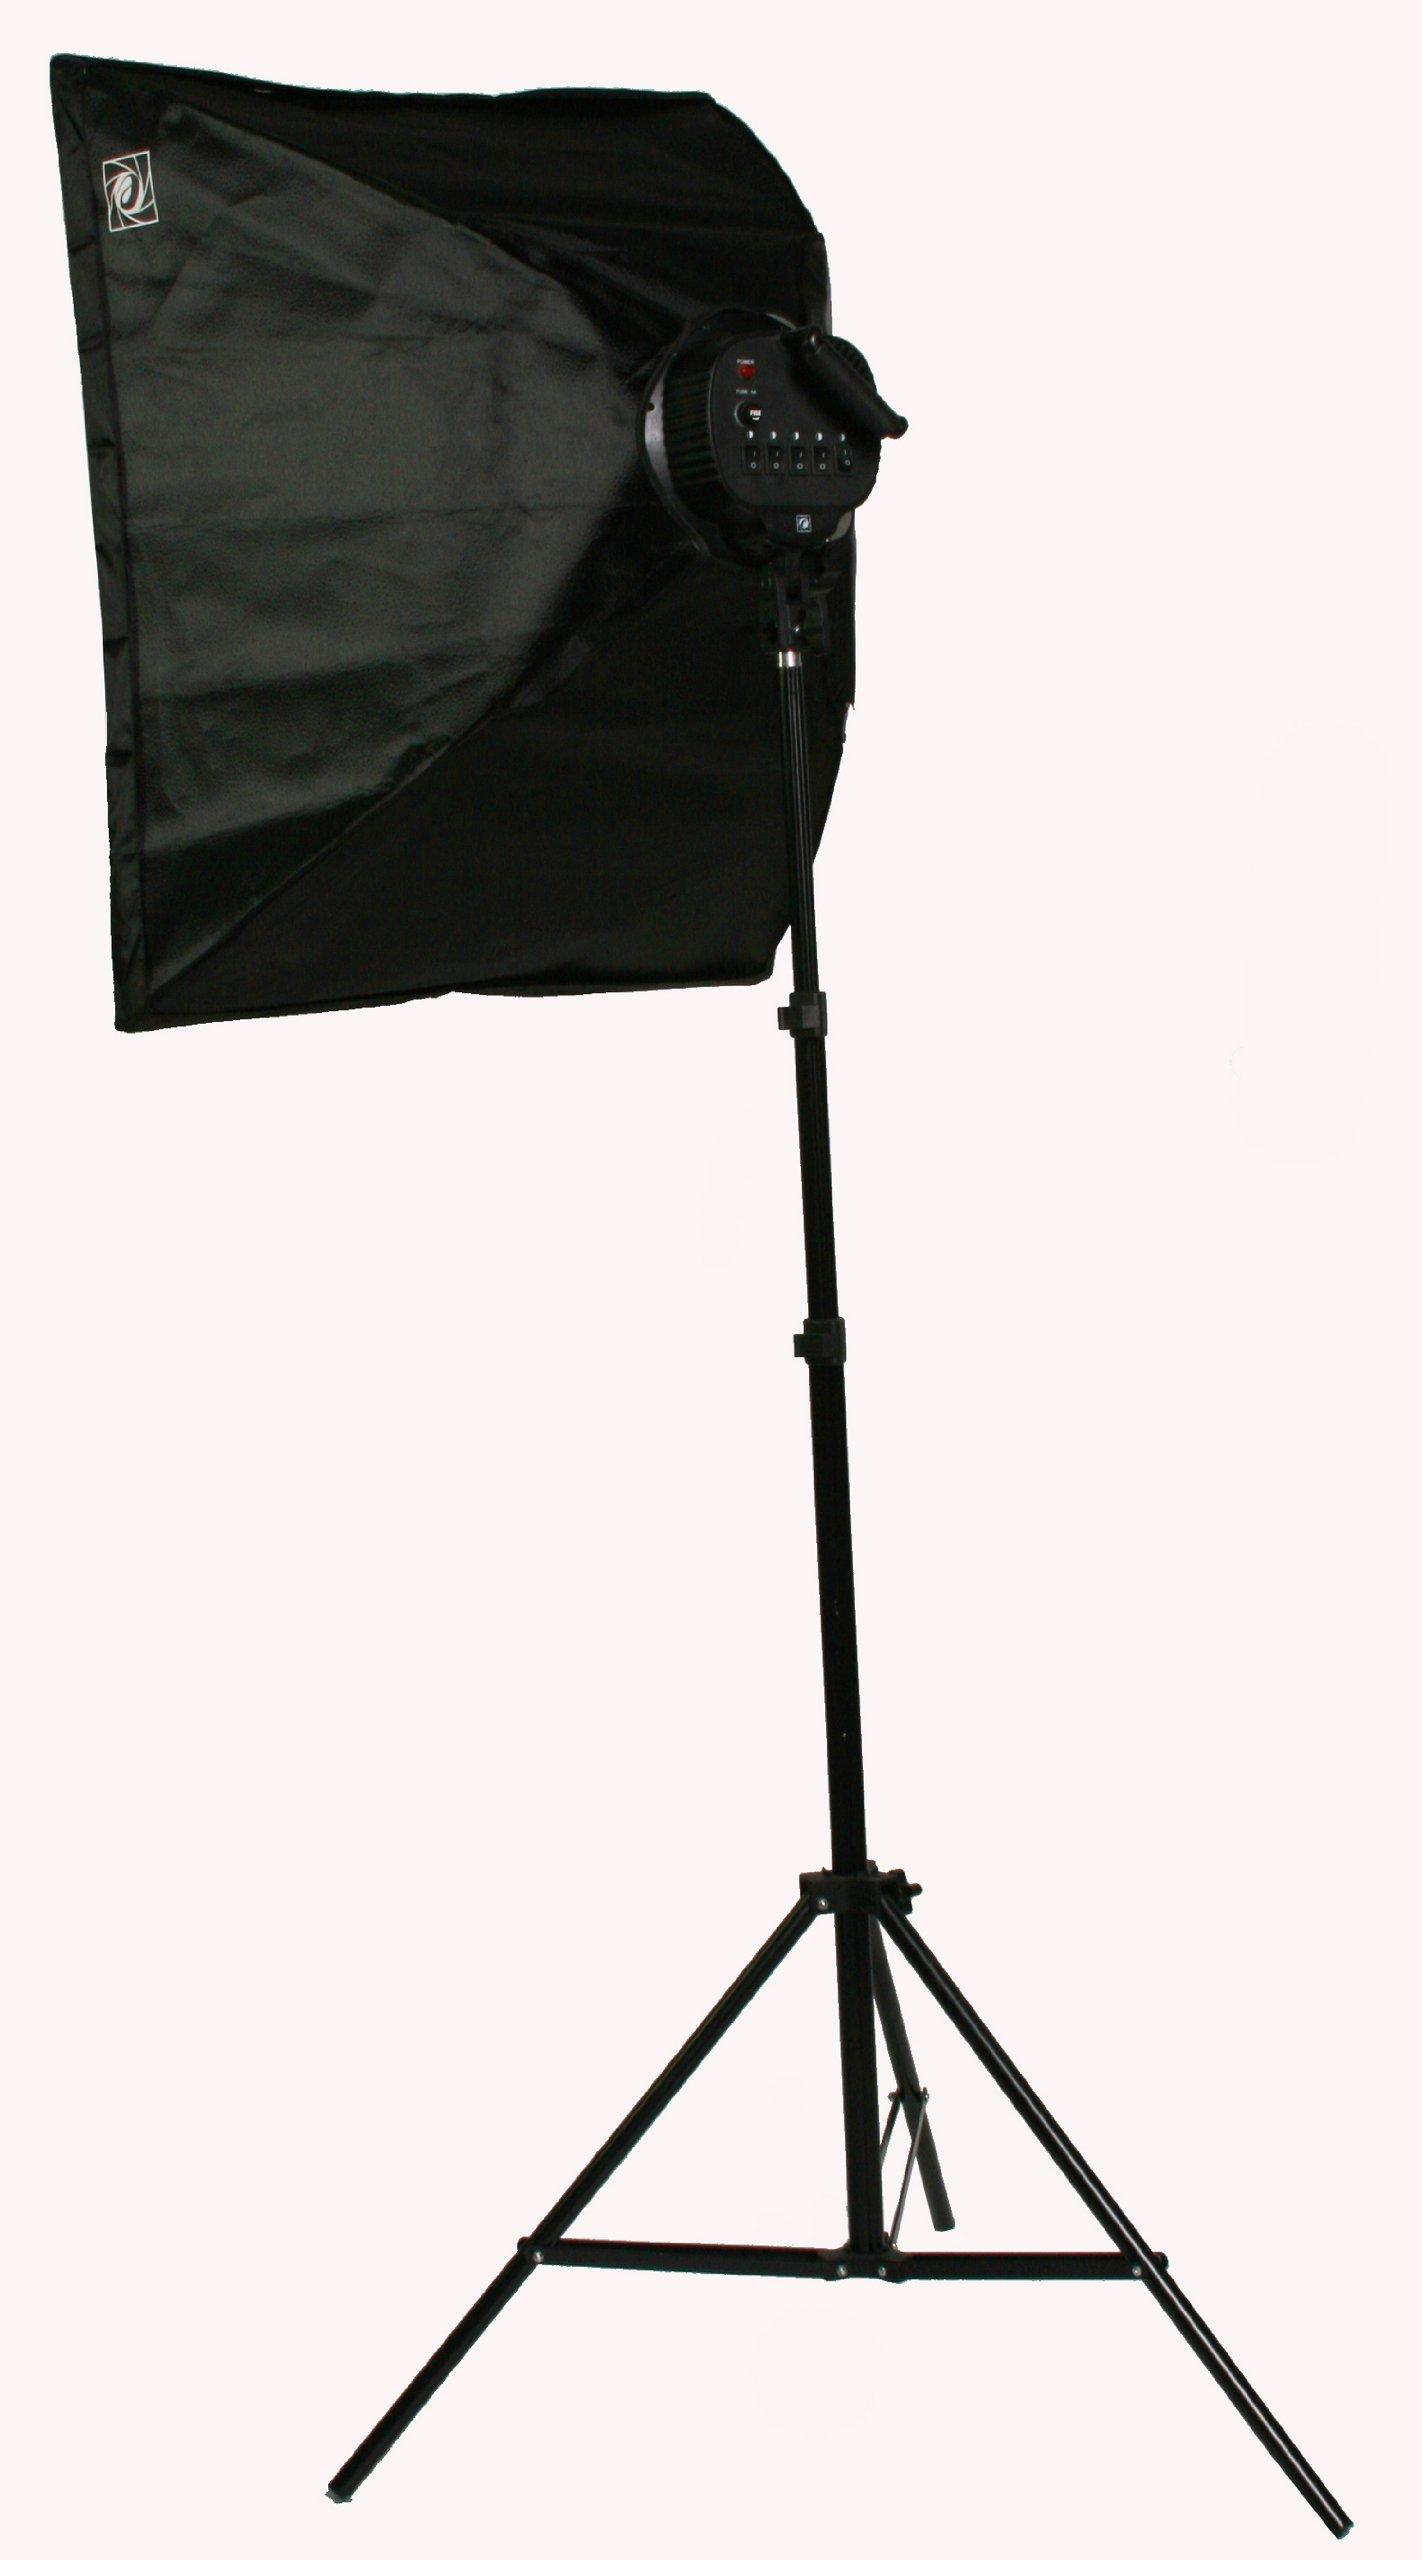 ePhoto Pro Studio Video 4500W Digital Photography Studio 3 Softbox Lighting Kit Light Set and Carrying Case H9060S3 by ePhoto